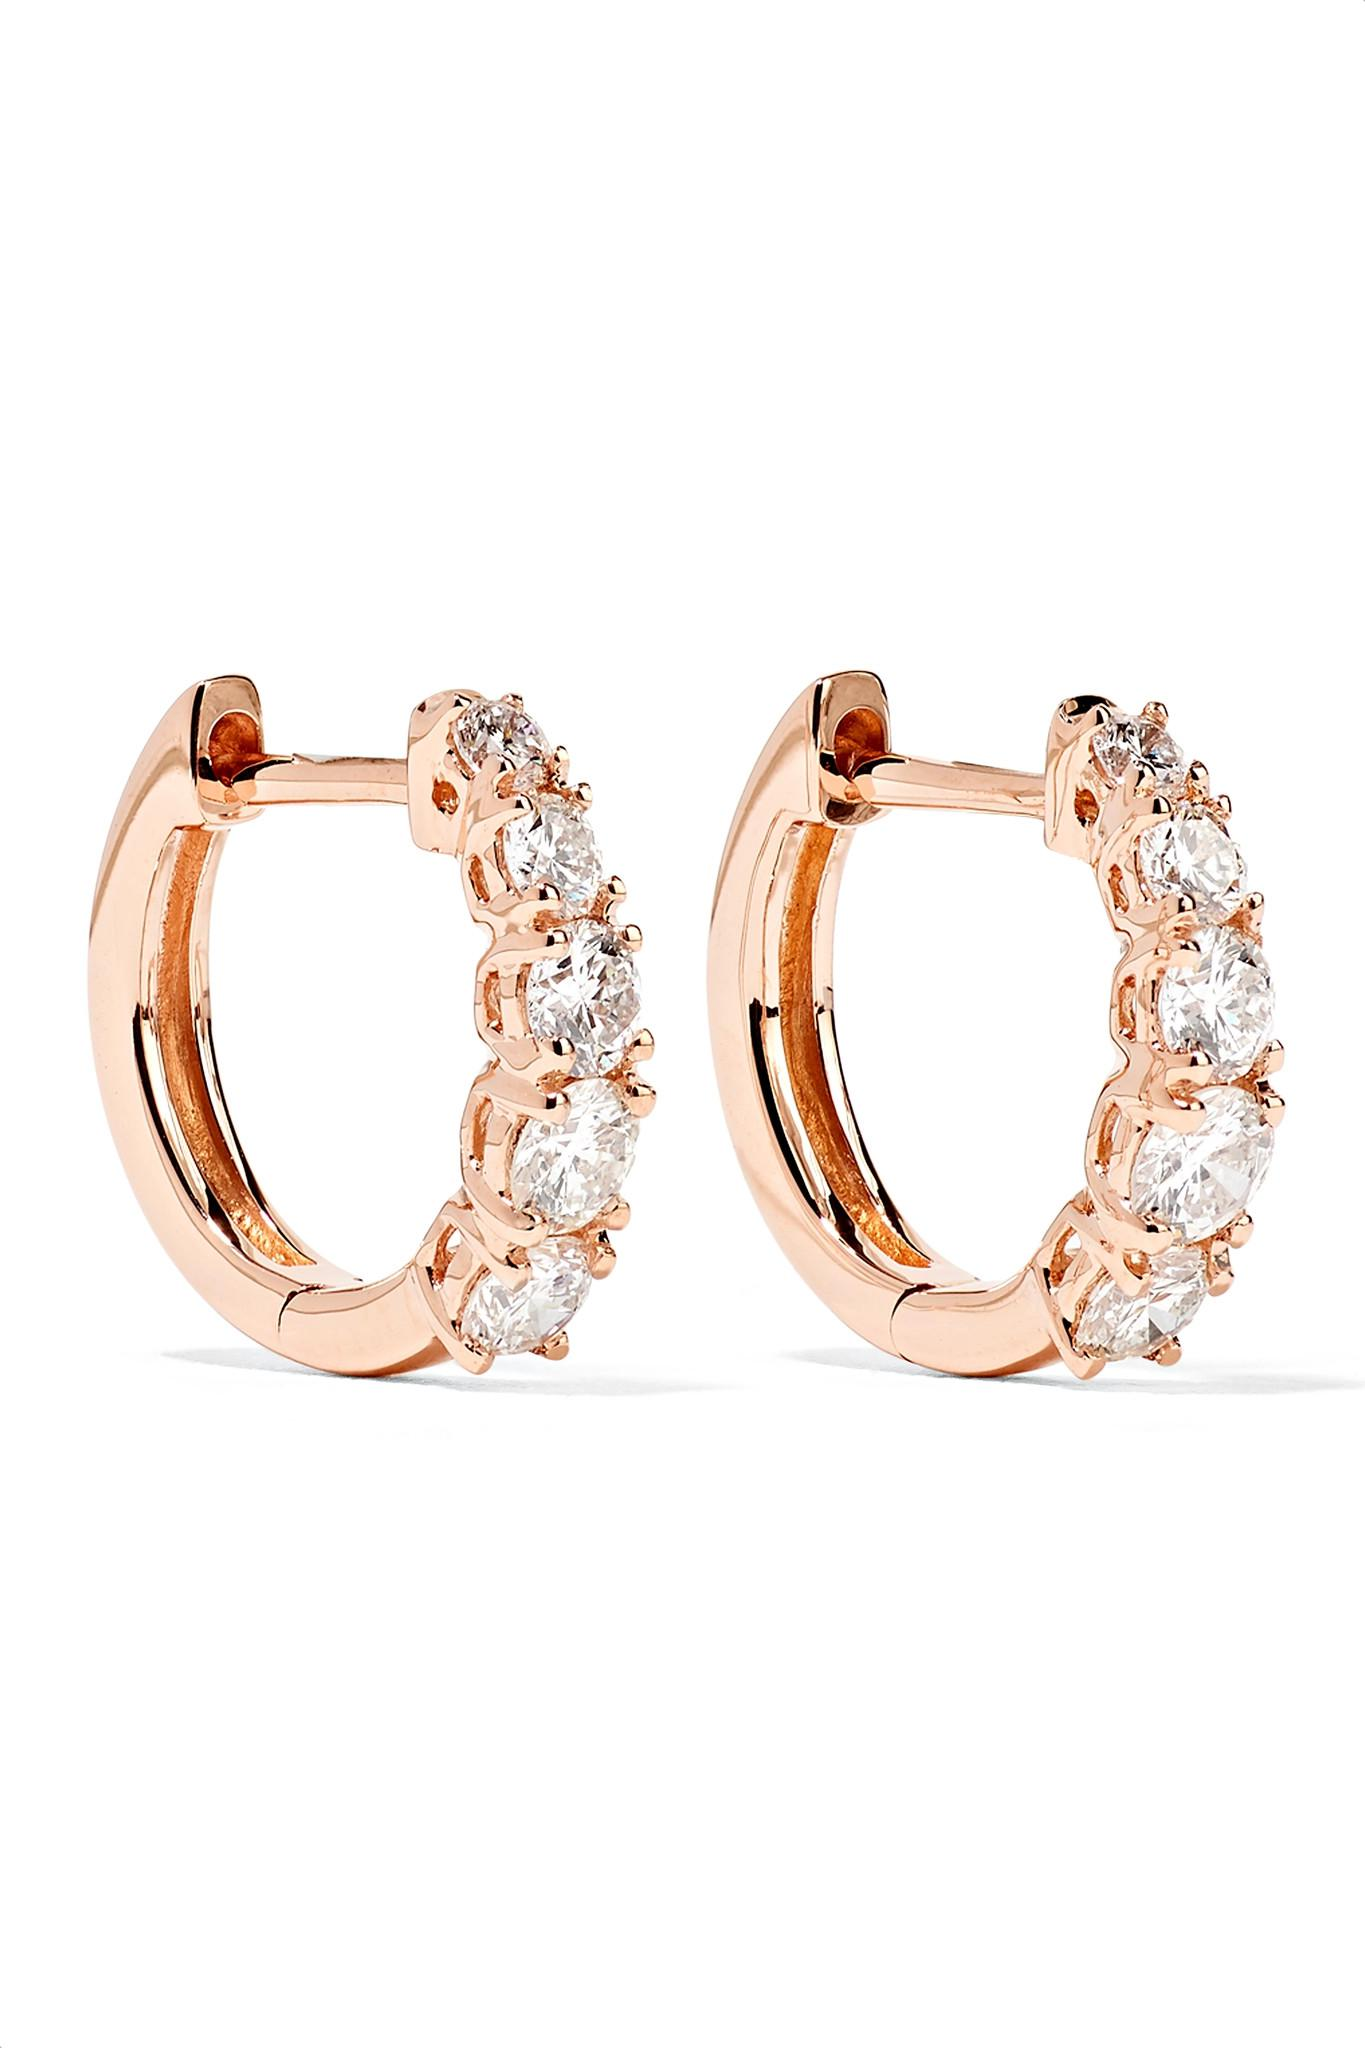 Anita Ko Huggies 18-karat Gold Diamond Earrings HC2FL089jb